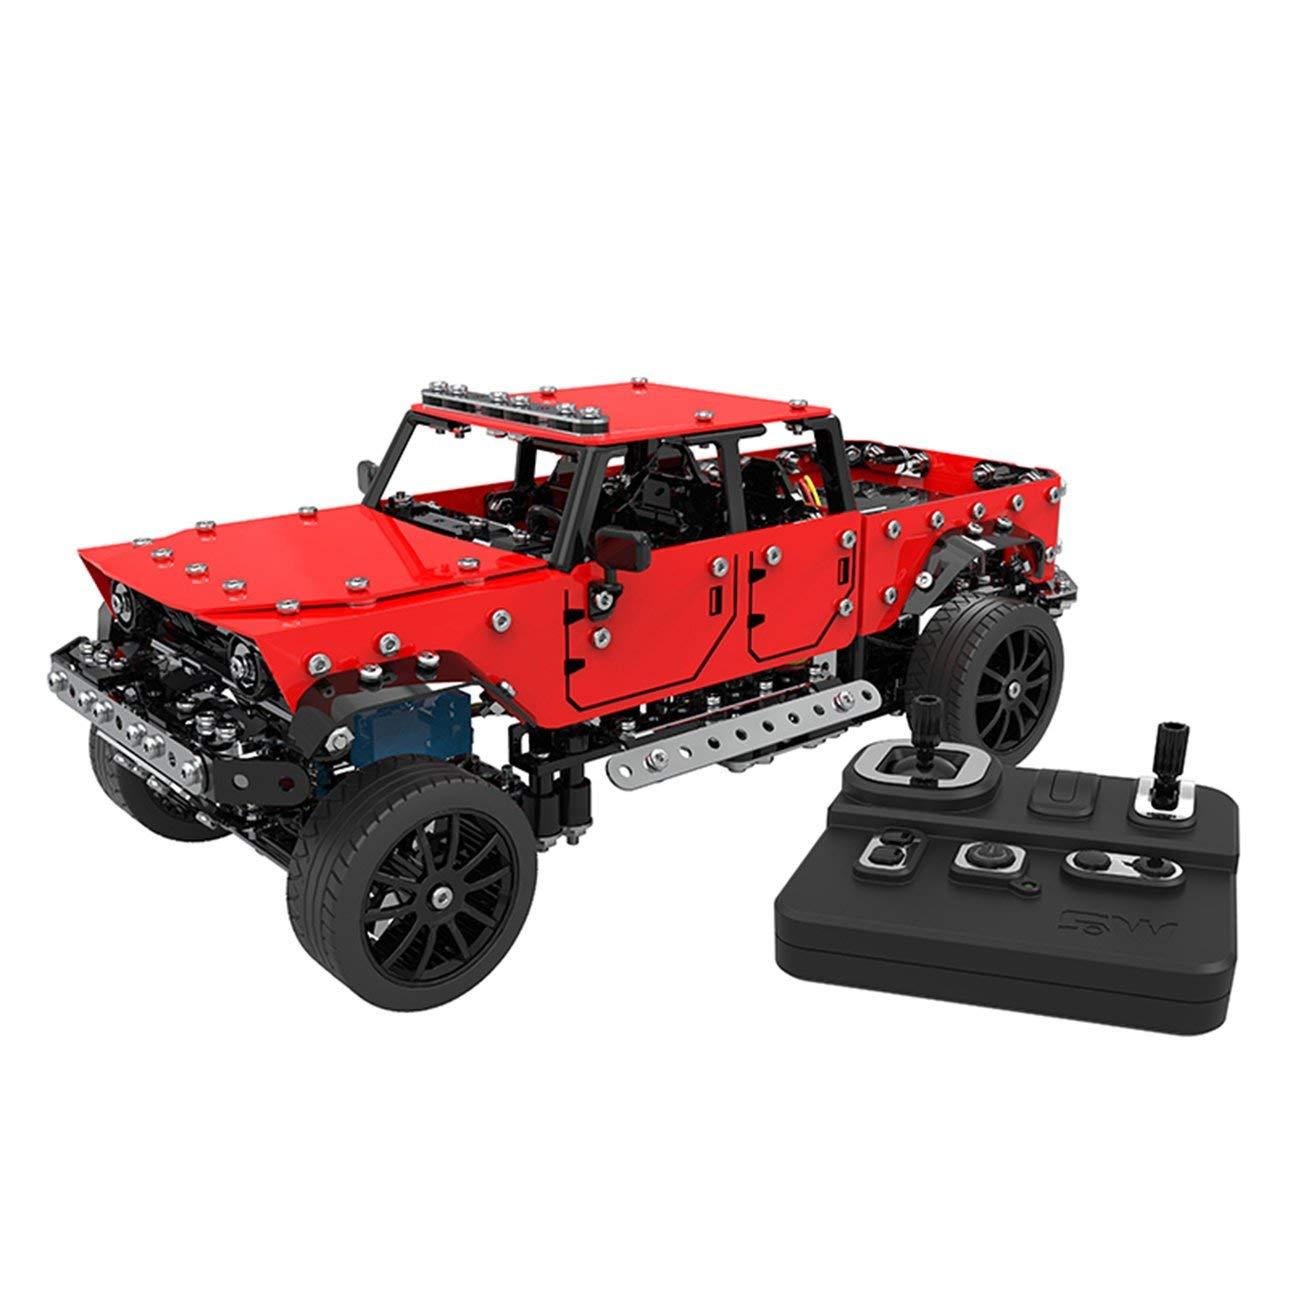 Ballylelly RC Car Steel World 2.4 GHz 8 canali di Ricarica USB Building Block Costruzione DIY Telecomando Jeep off-Road Giocattoli RC Cars of